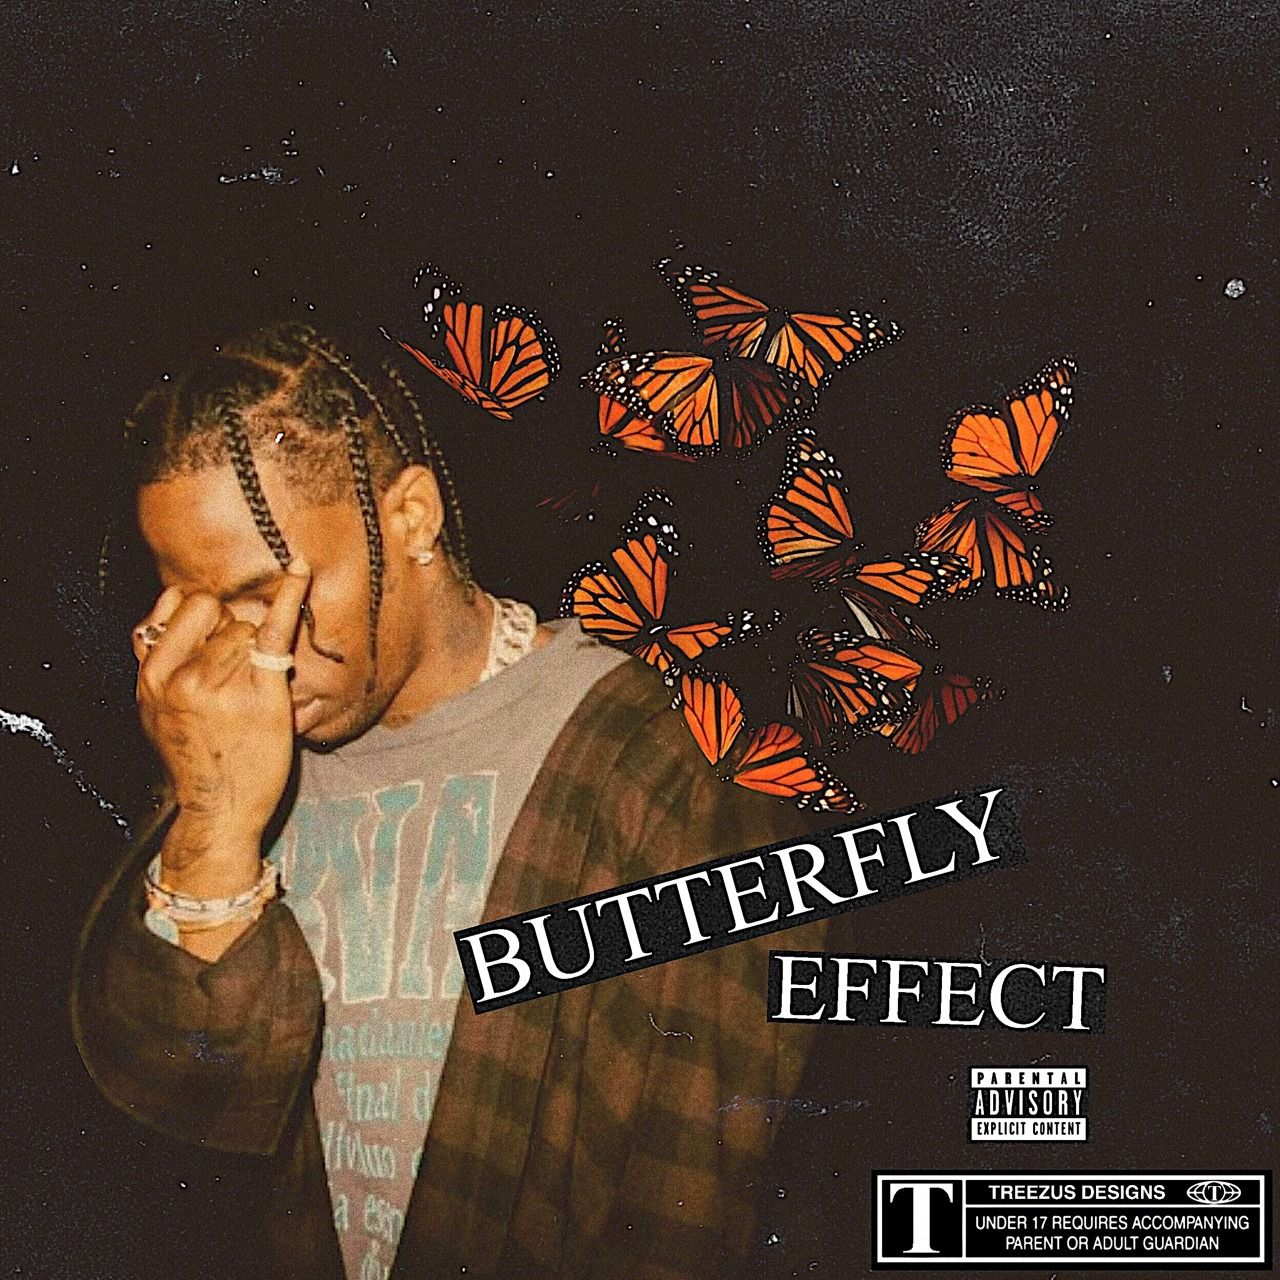 Ian Connor Tumblr Rappers Butterfly Effect Travis Scott